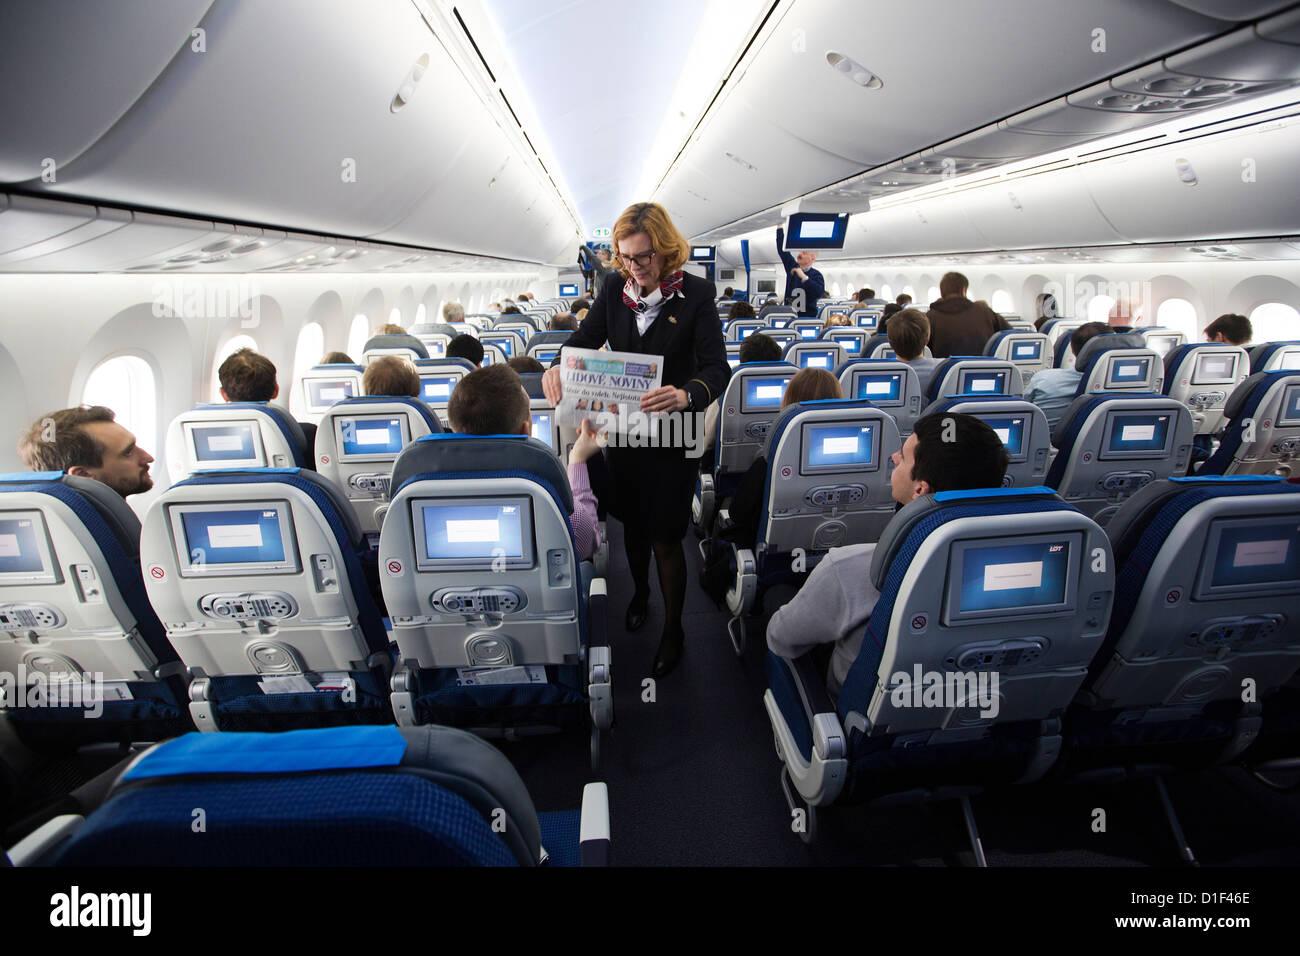 Boeing 787 Dreamliner - wordpresscom2012.blogspot.com